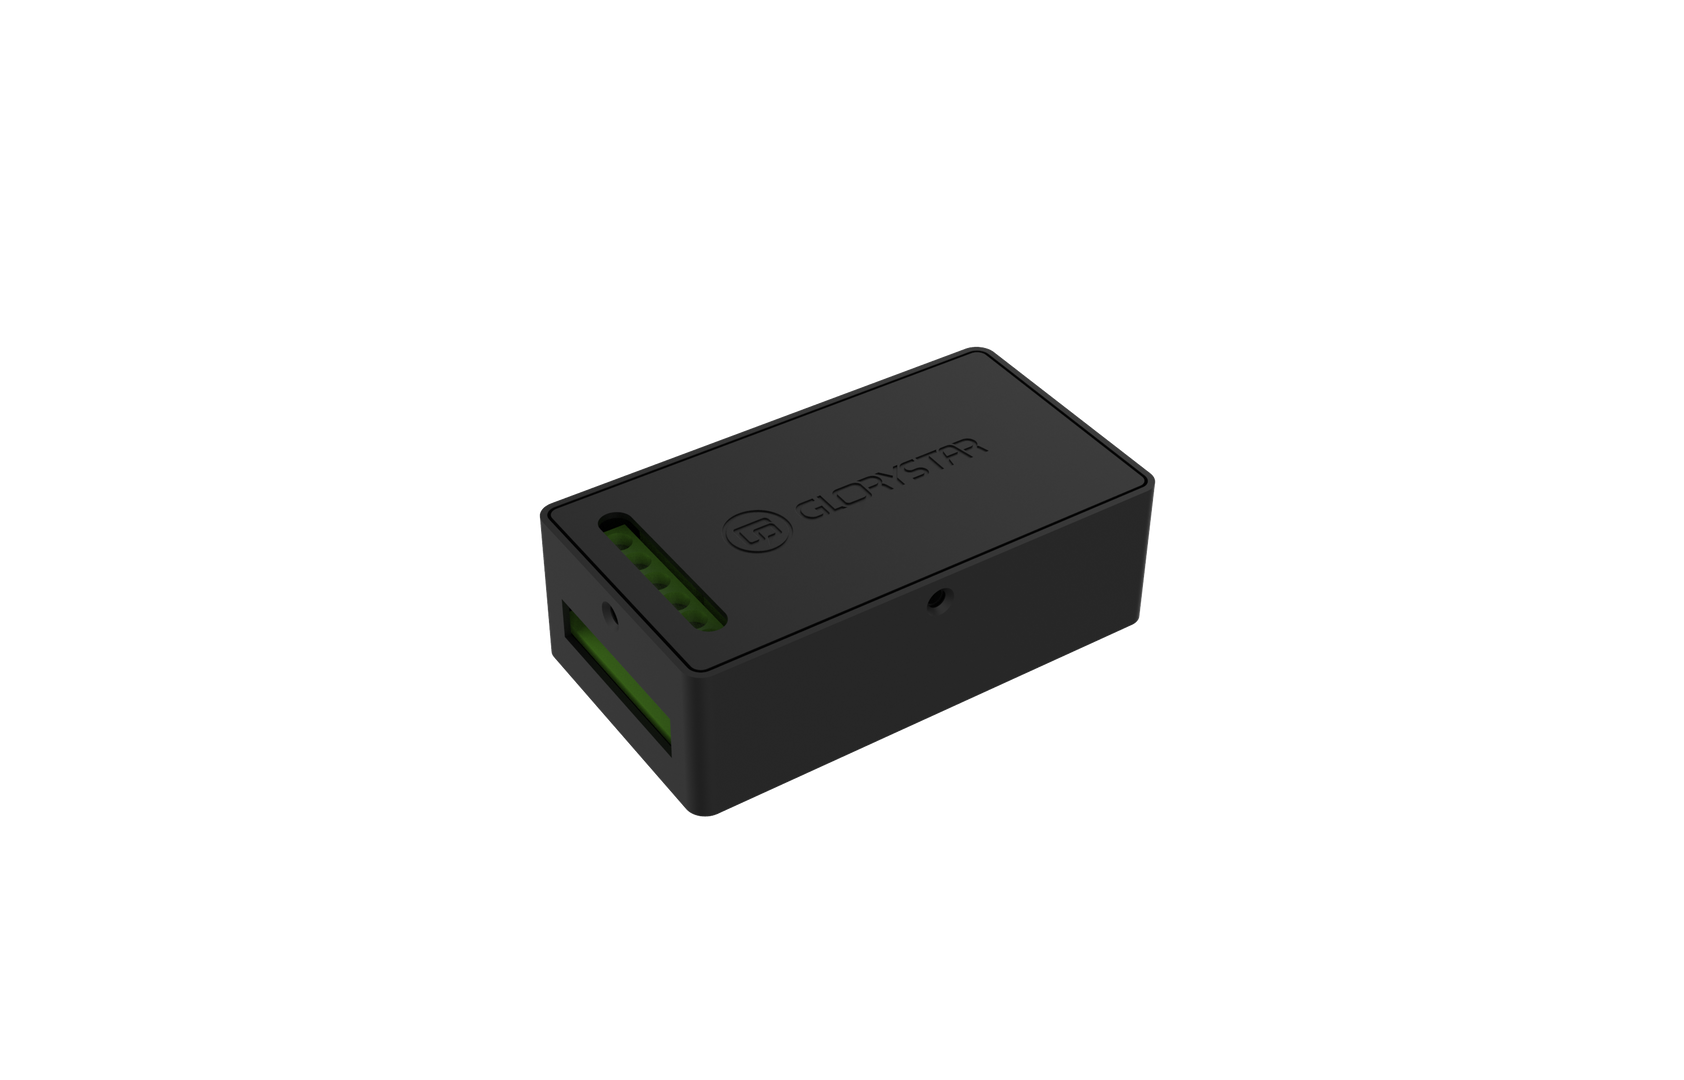 USB Relay Box